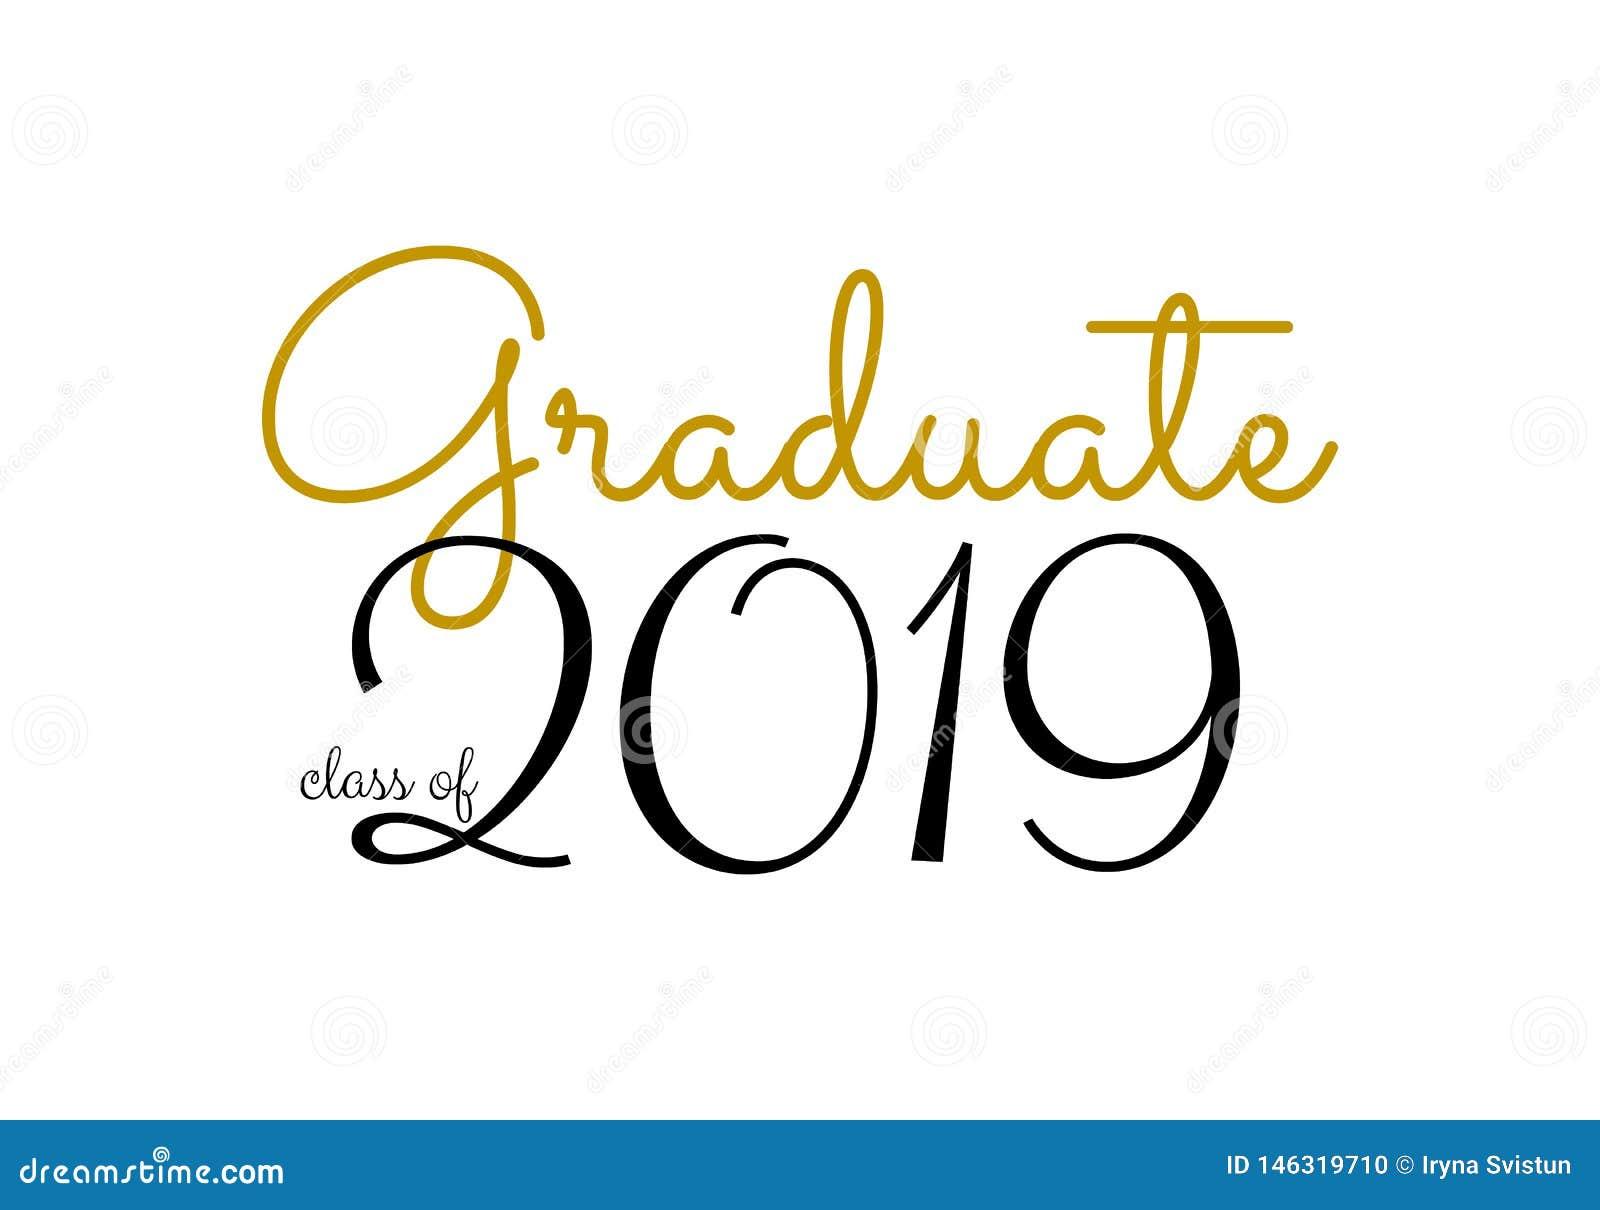 Graduation label. Vector text for graduation design, congratulation event, party, high school or college graduate